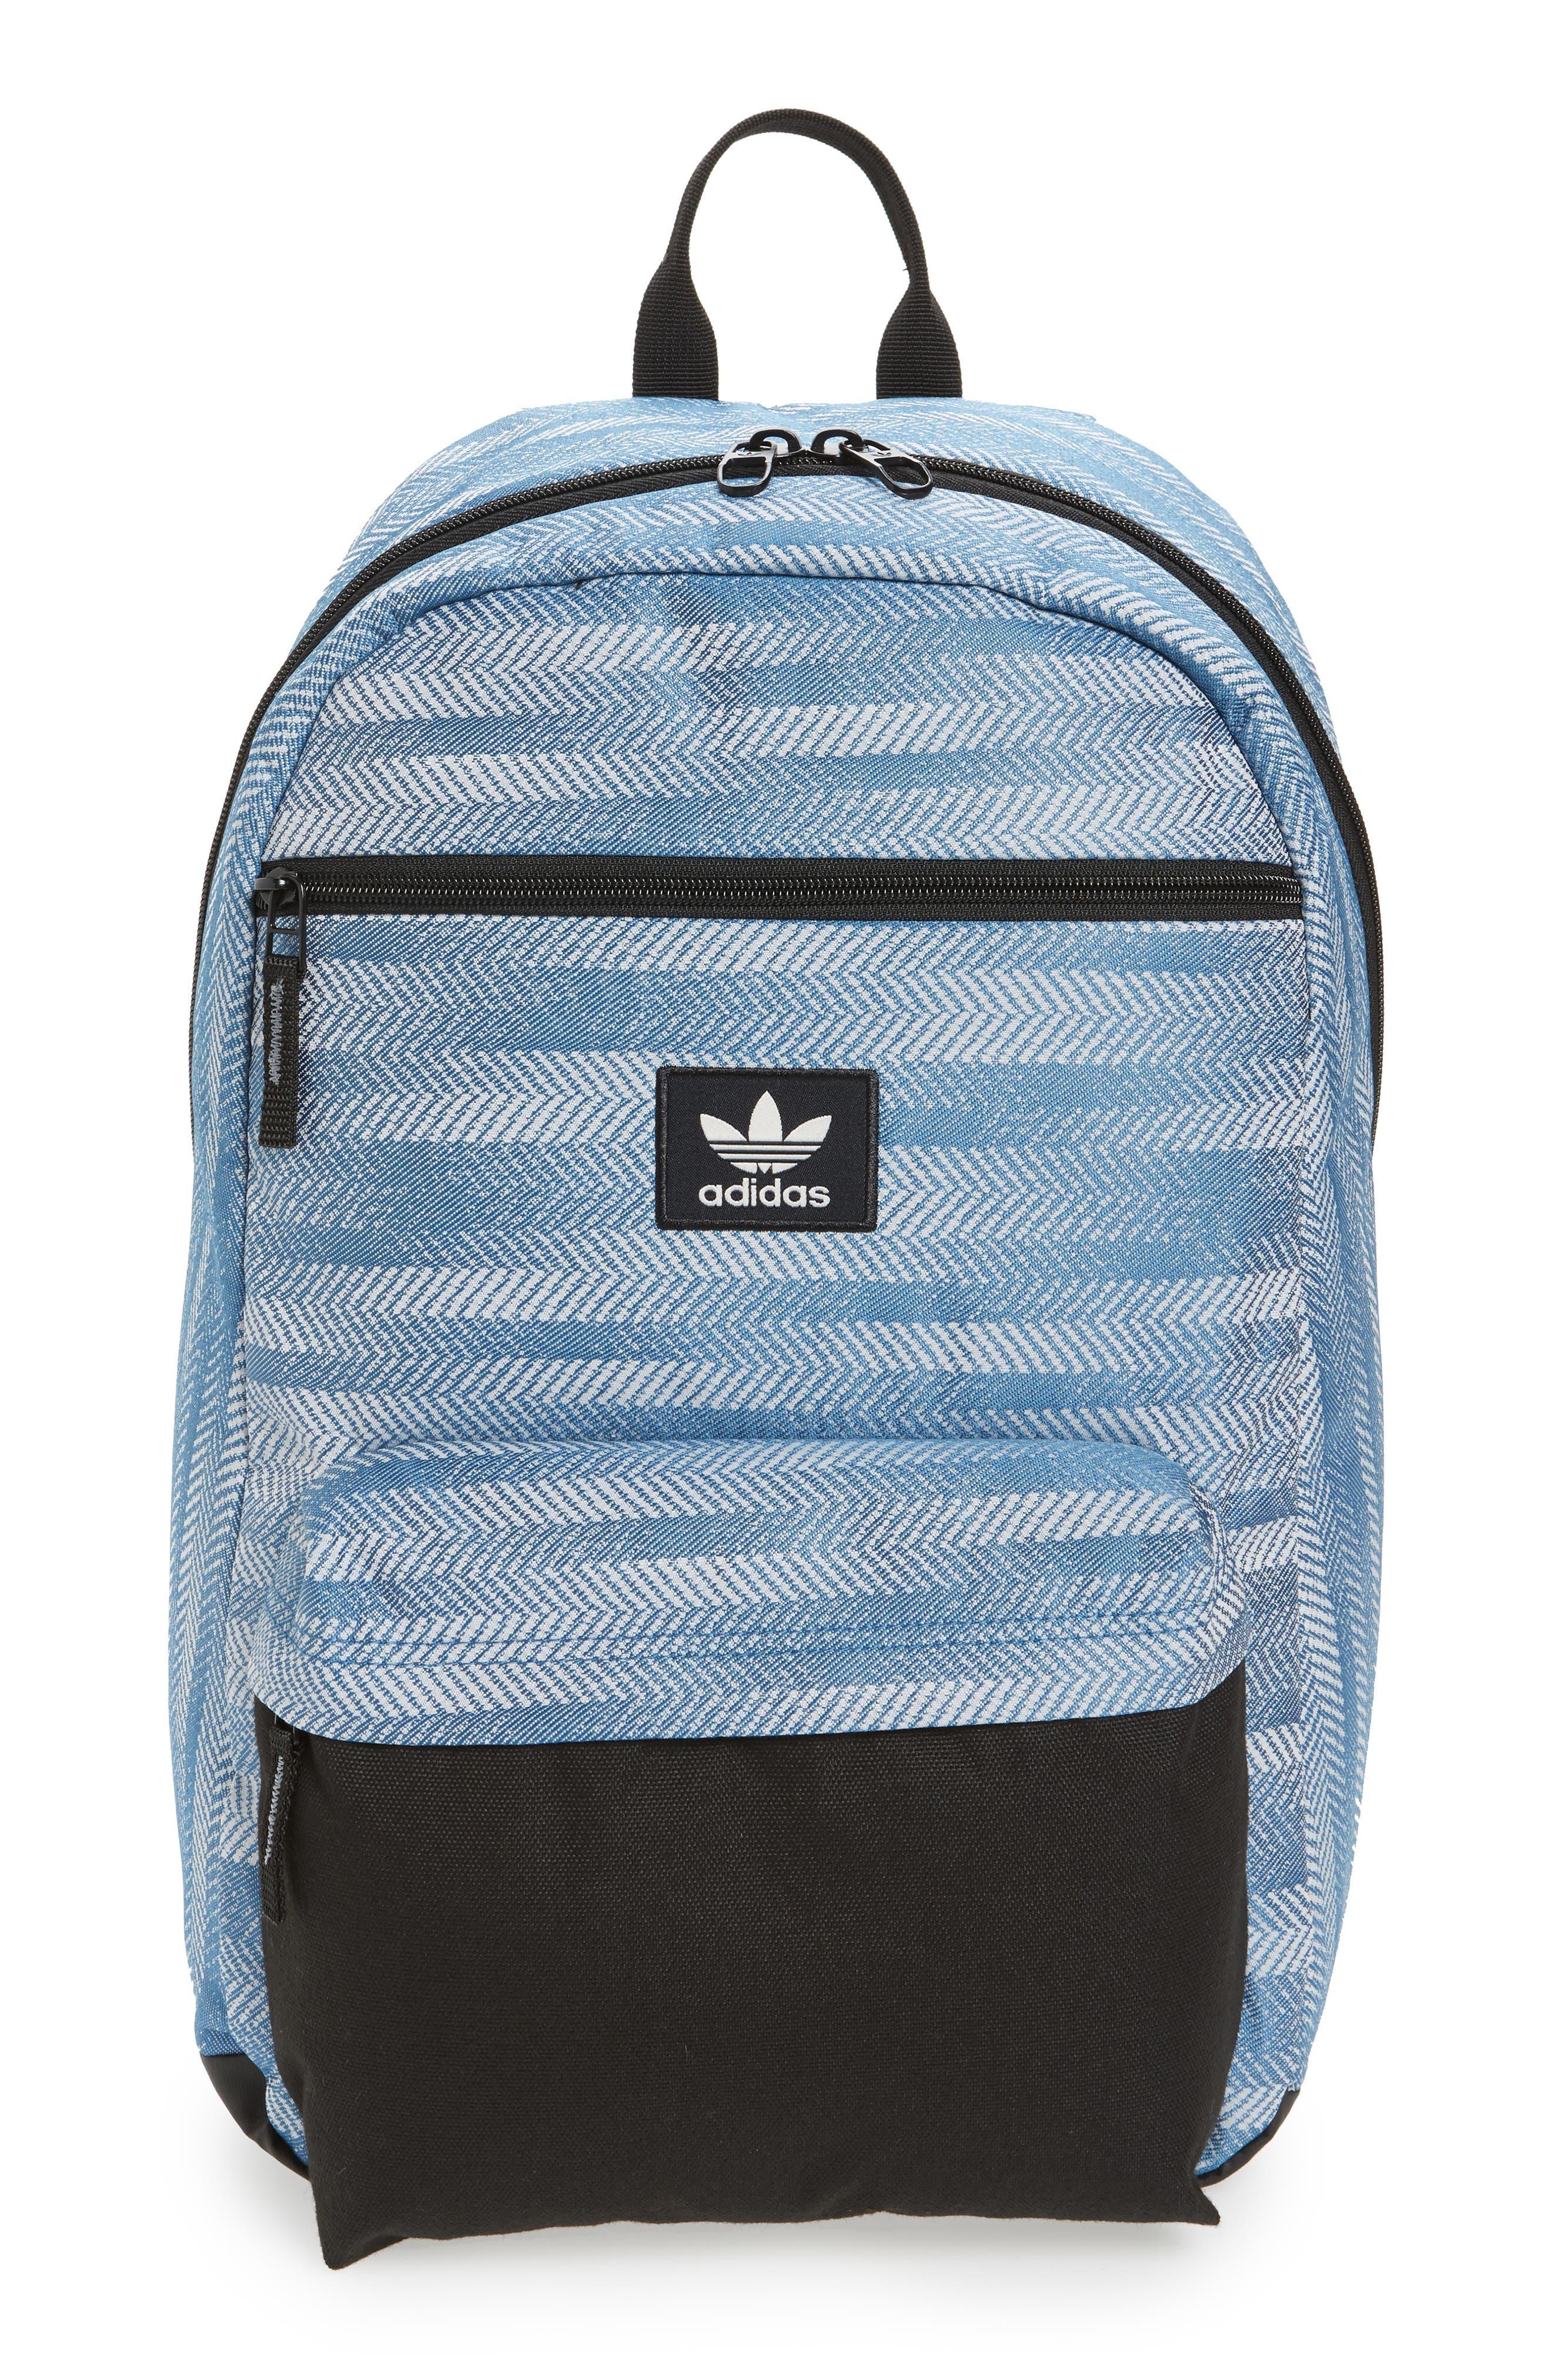 NTL Plus Backpack,                             Main thumbnail 1, color,                             CORE BLUE/ BLACK